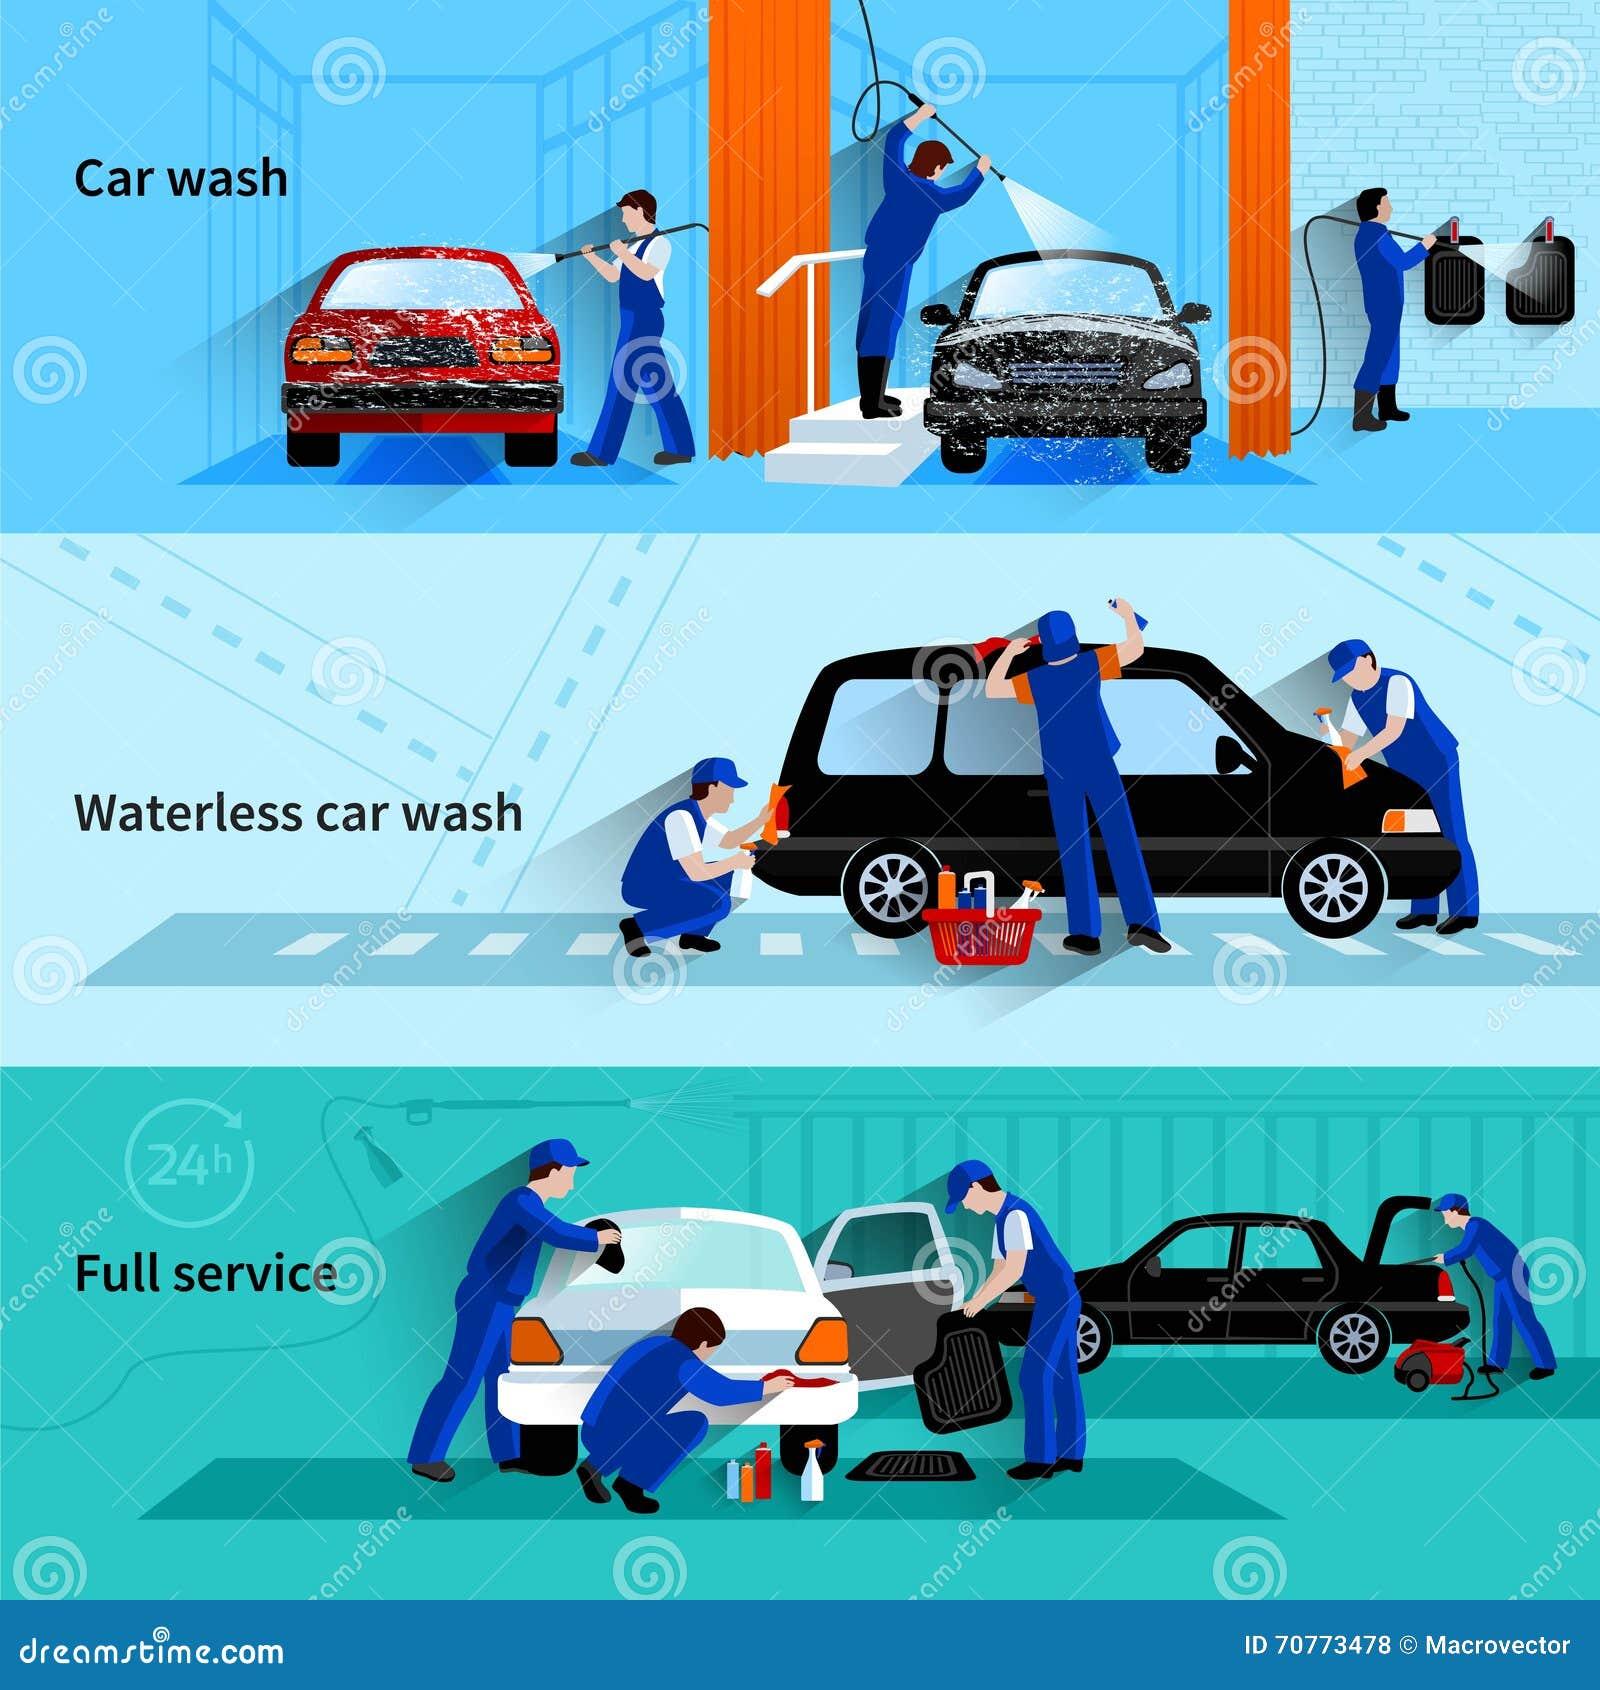 Car Wash Services : Car wash service flat banners cartoon vector